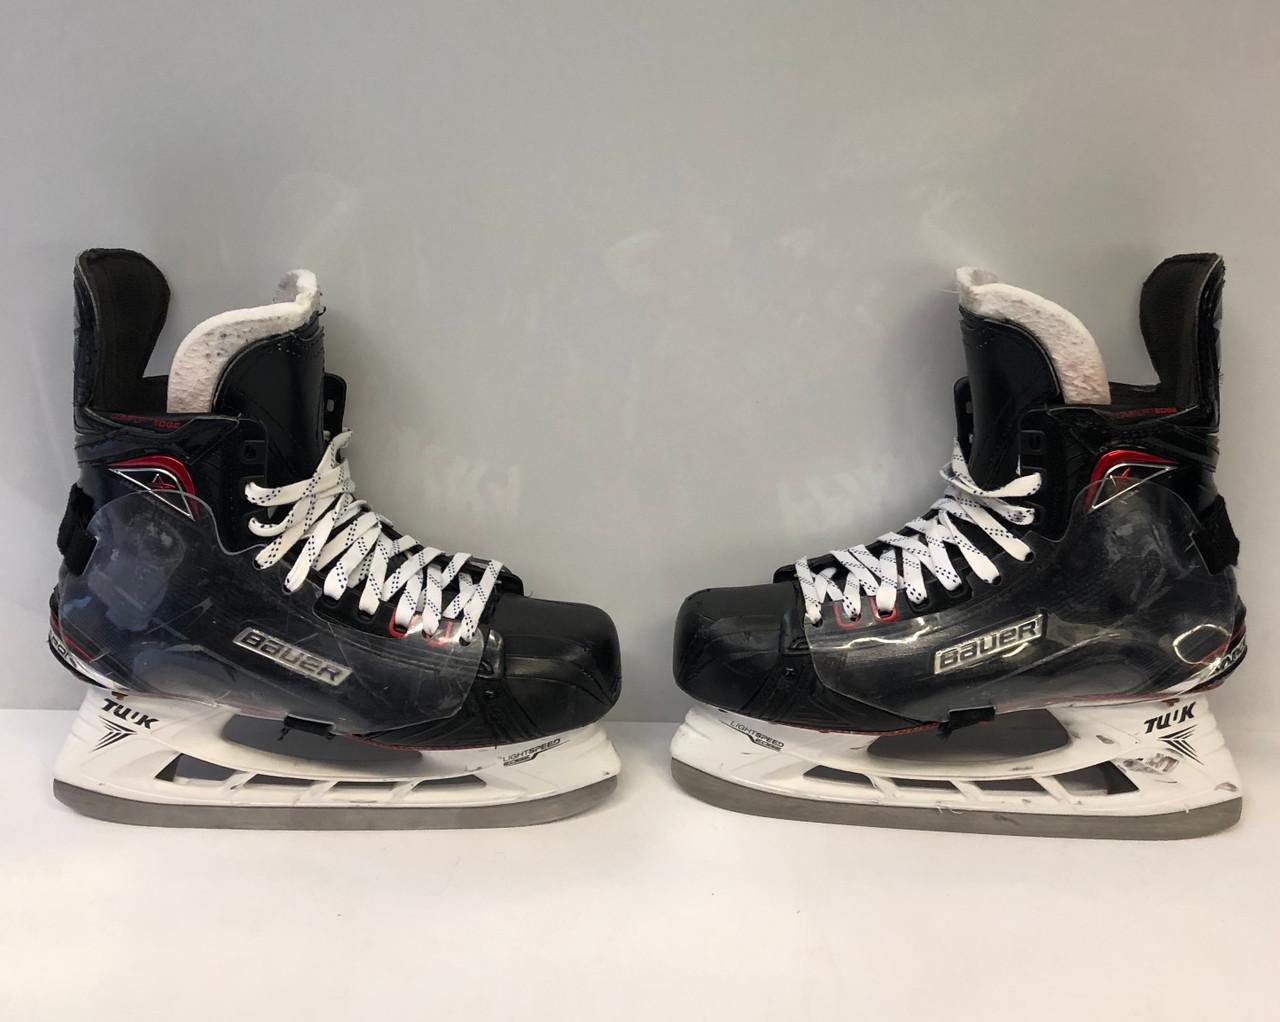 Used Hockey Skates >> Bauer Vapor 1x 2 0 Custom Pro Stock Ice Hockey Skates 10 1 2 D Used